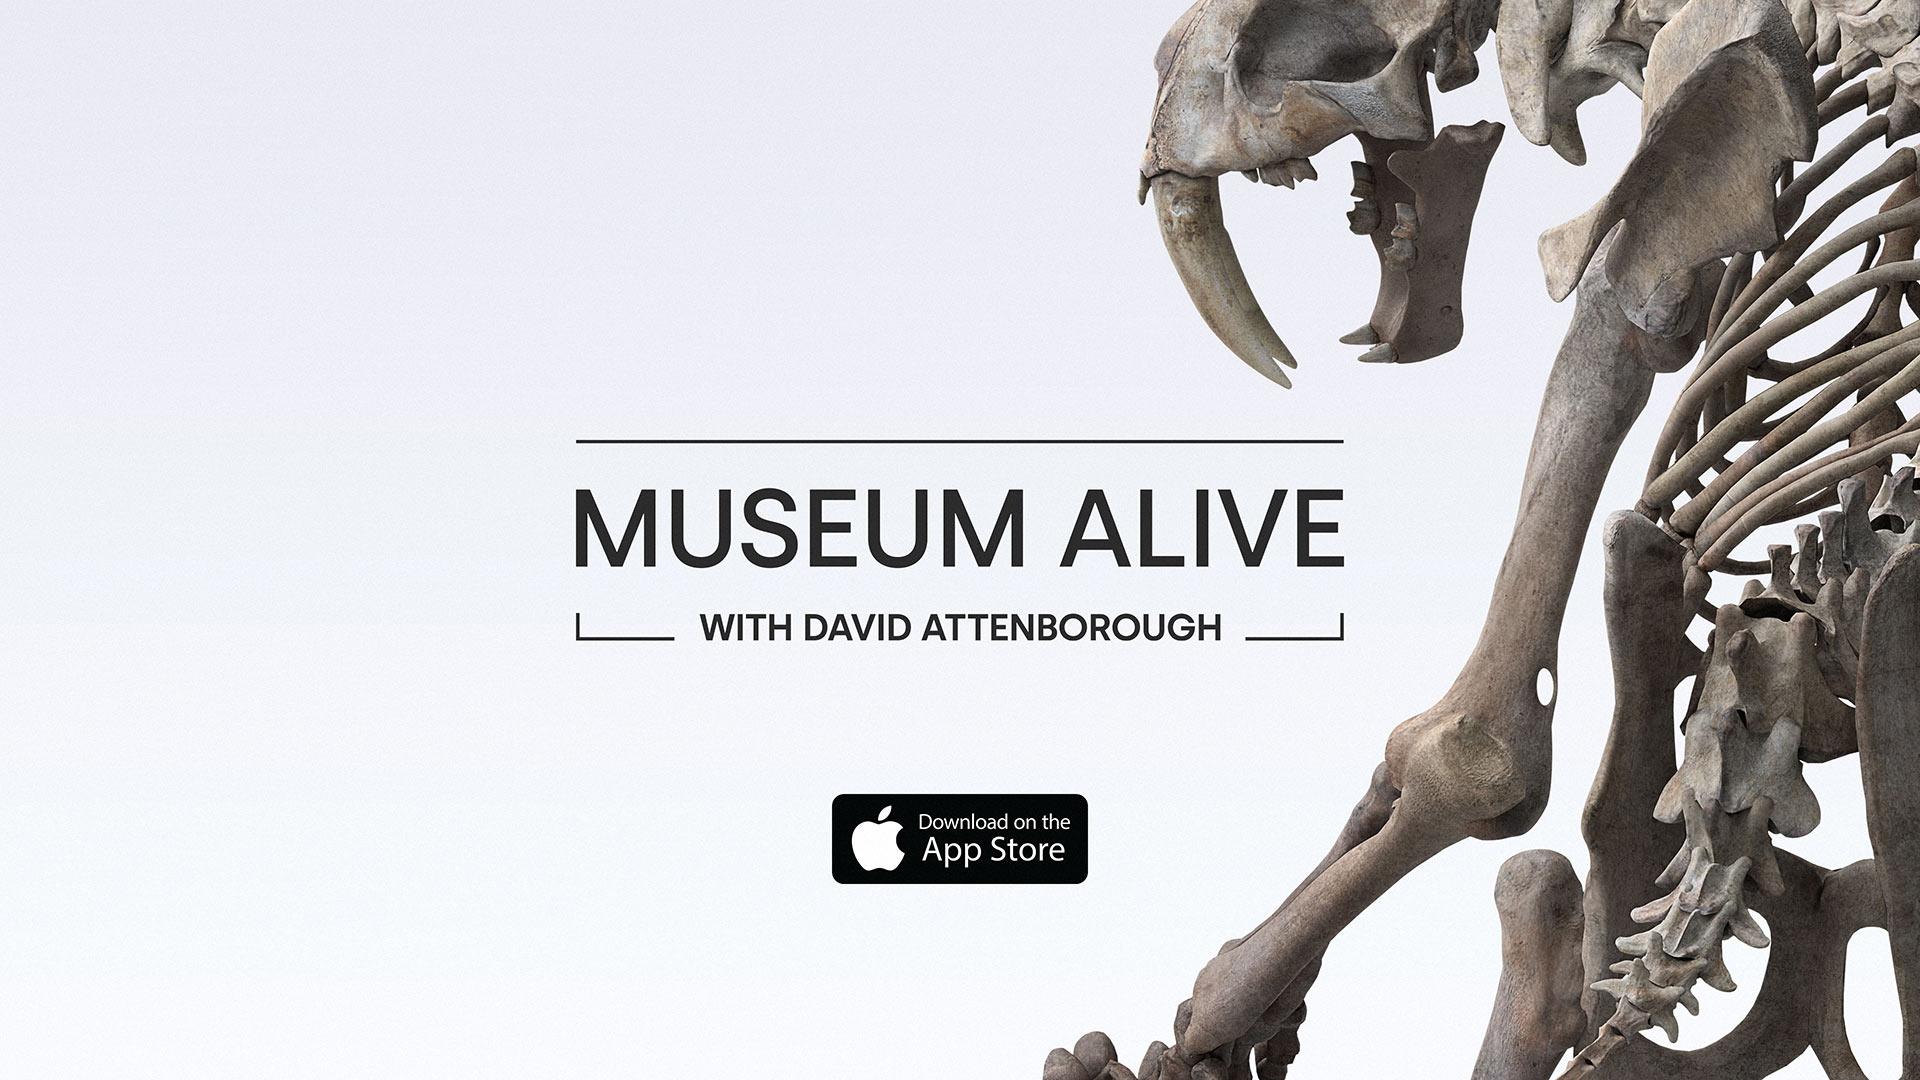 Museum Alive AR With David Attenborough